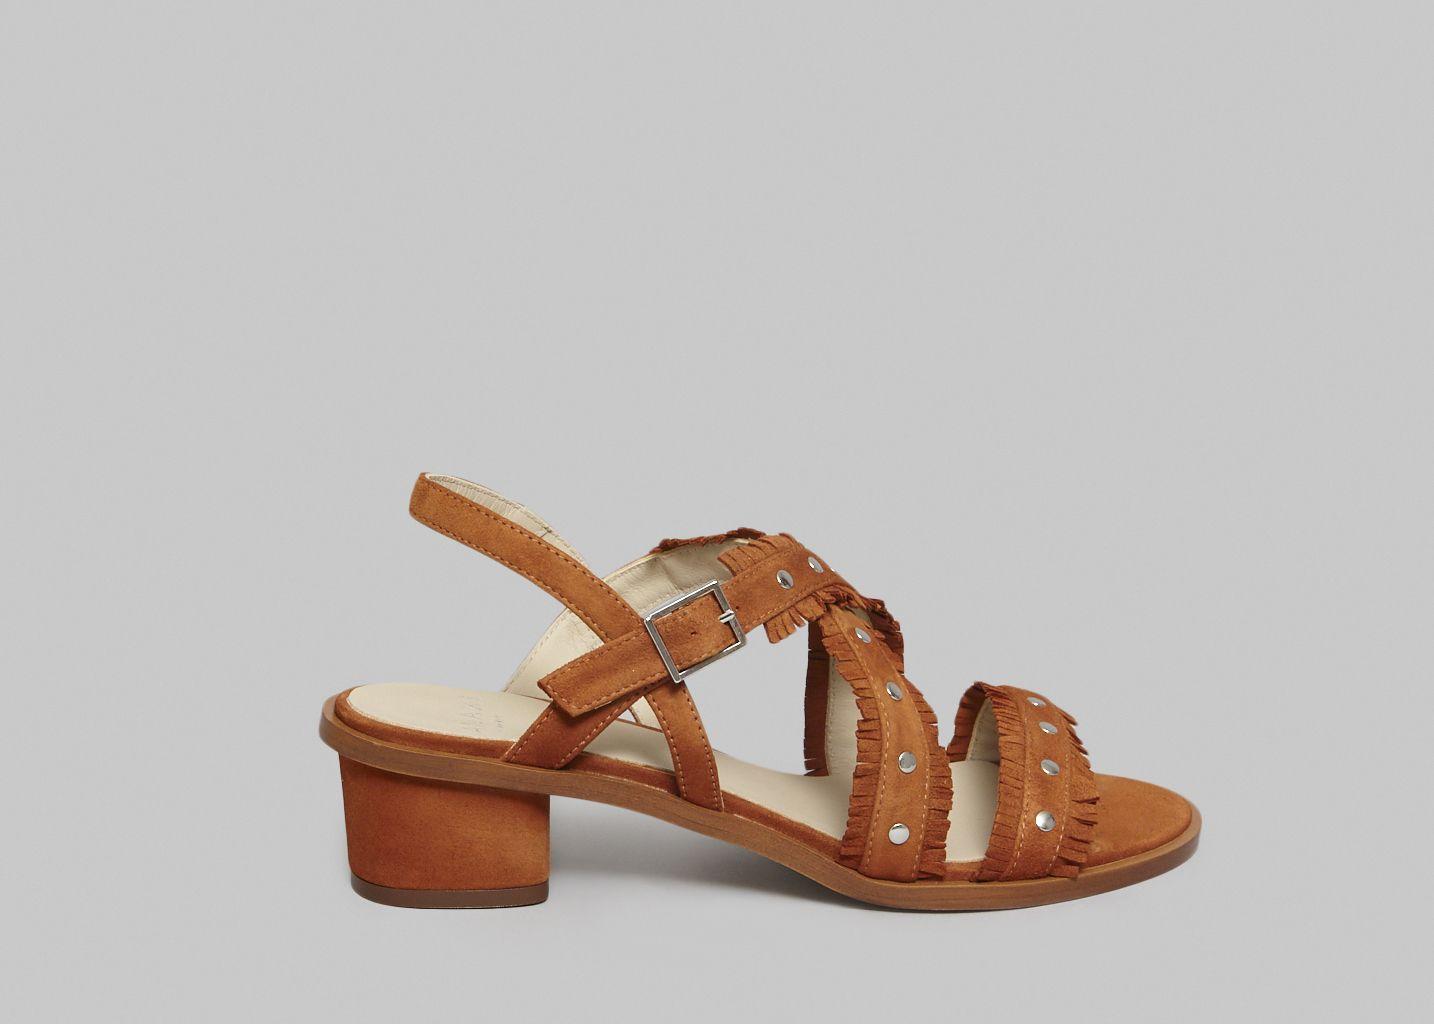 Sandales Diadema - Anaki